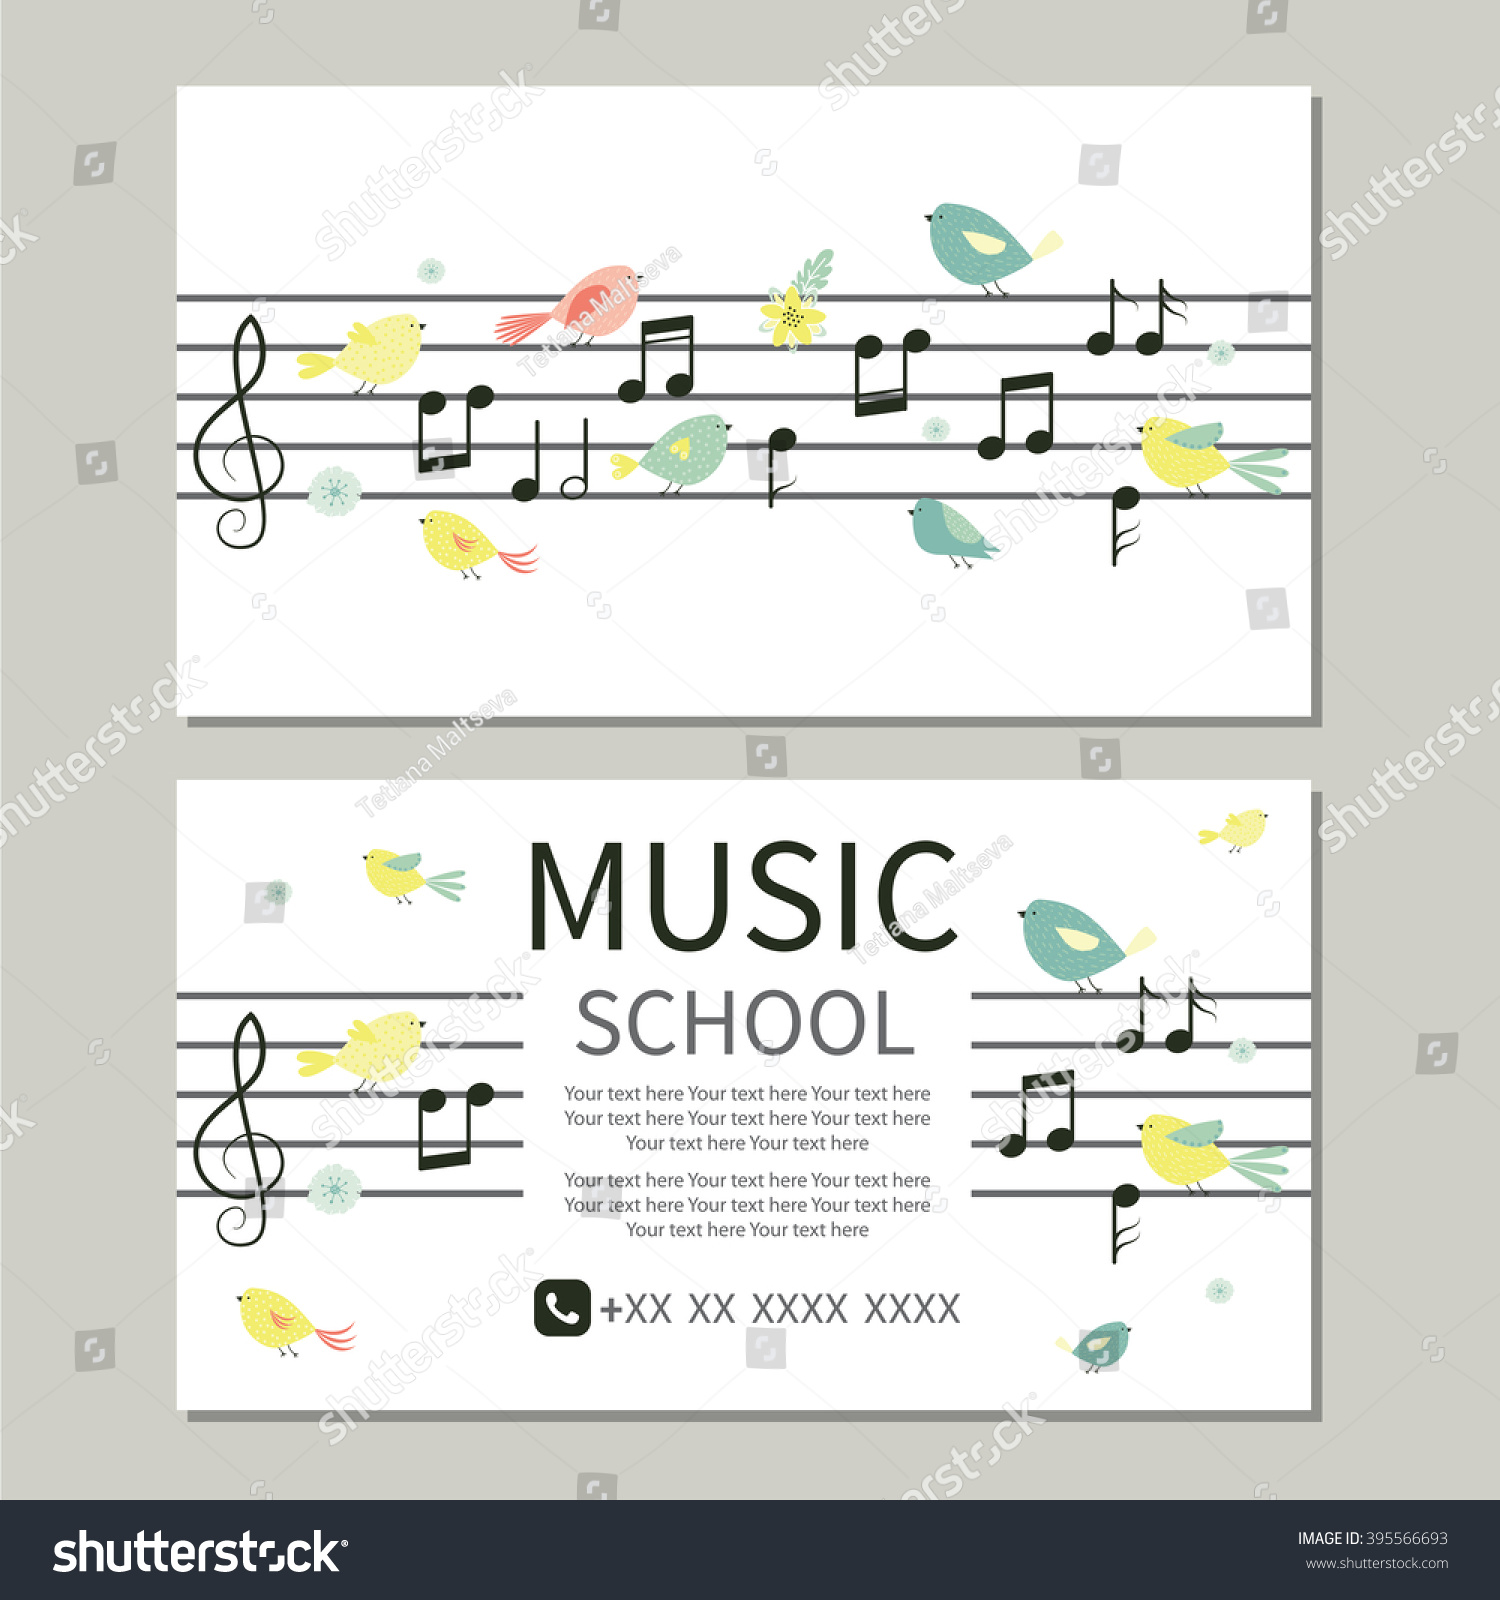 Business Card Music School Cute Design Stock Vector (2018) 395566693 ...